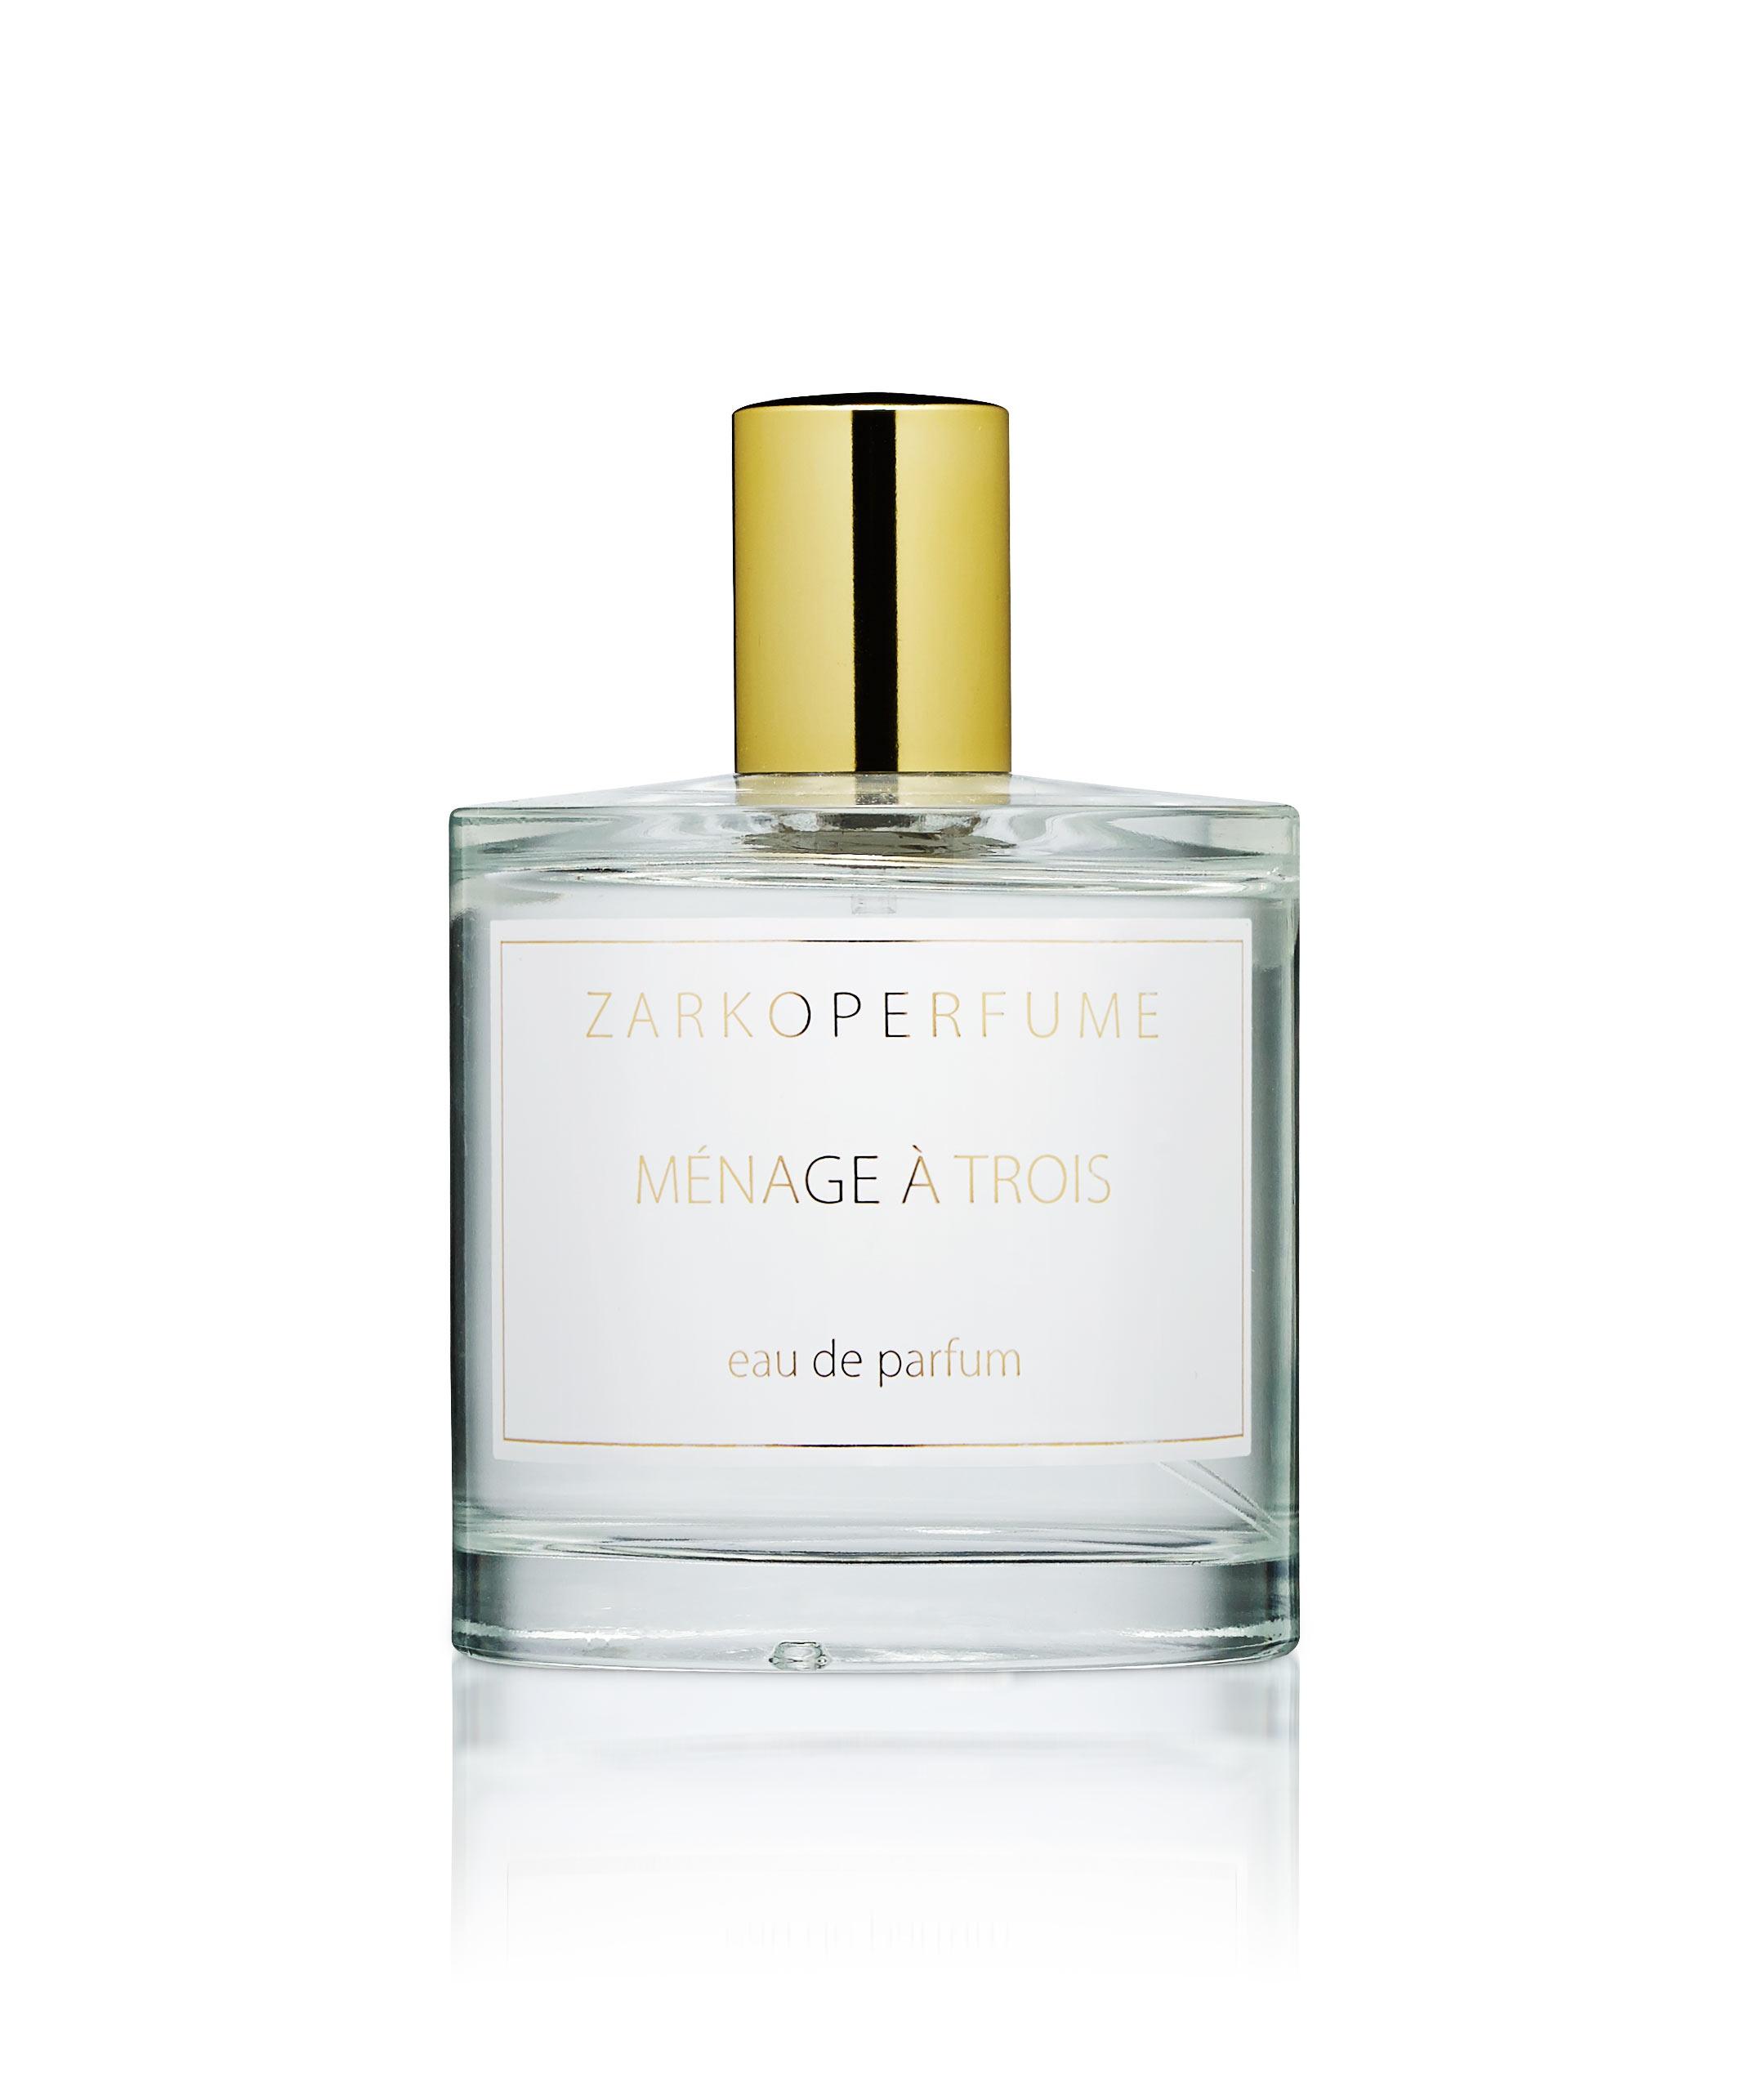 Zarkoperfume Ménage à Trois, 100 ml